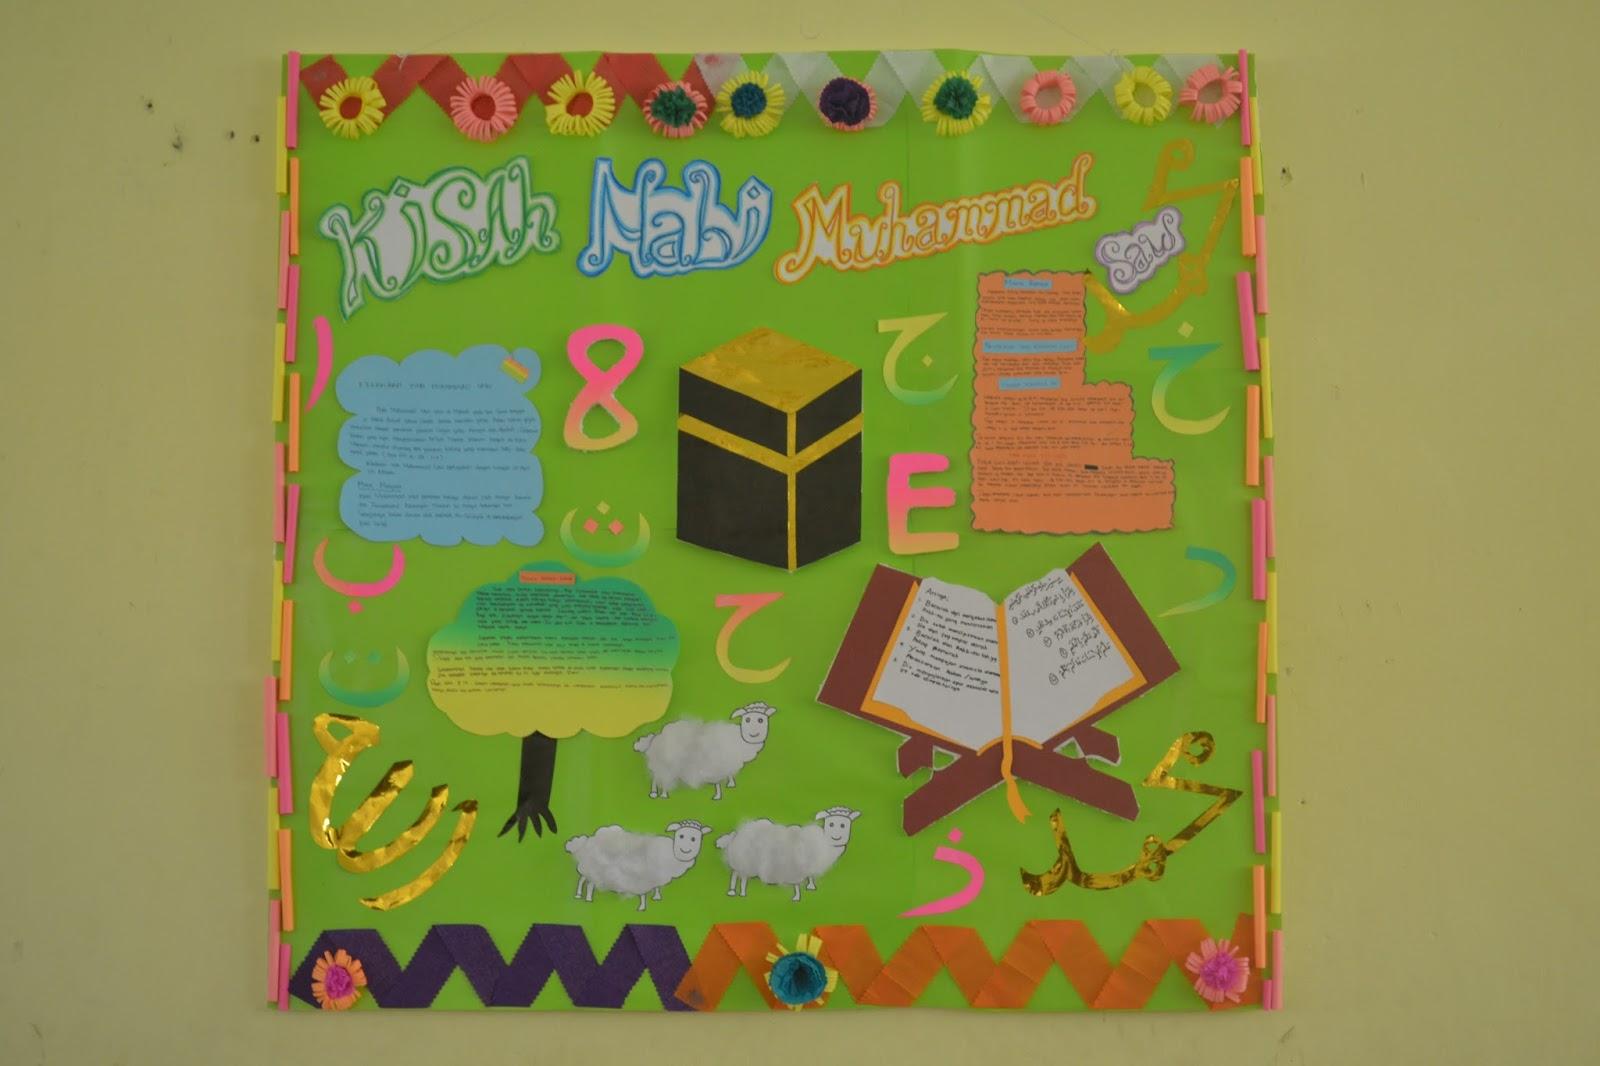 Hiasan Dinding Kelas Smp Yang Kreatif